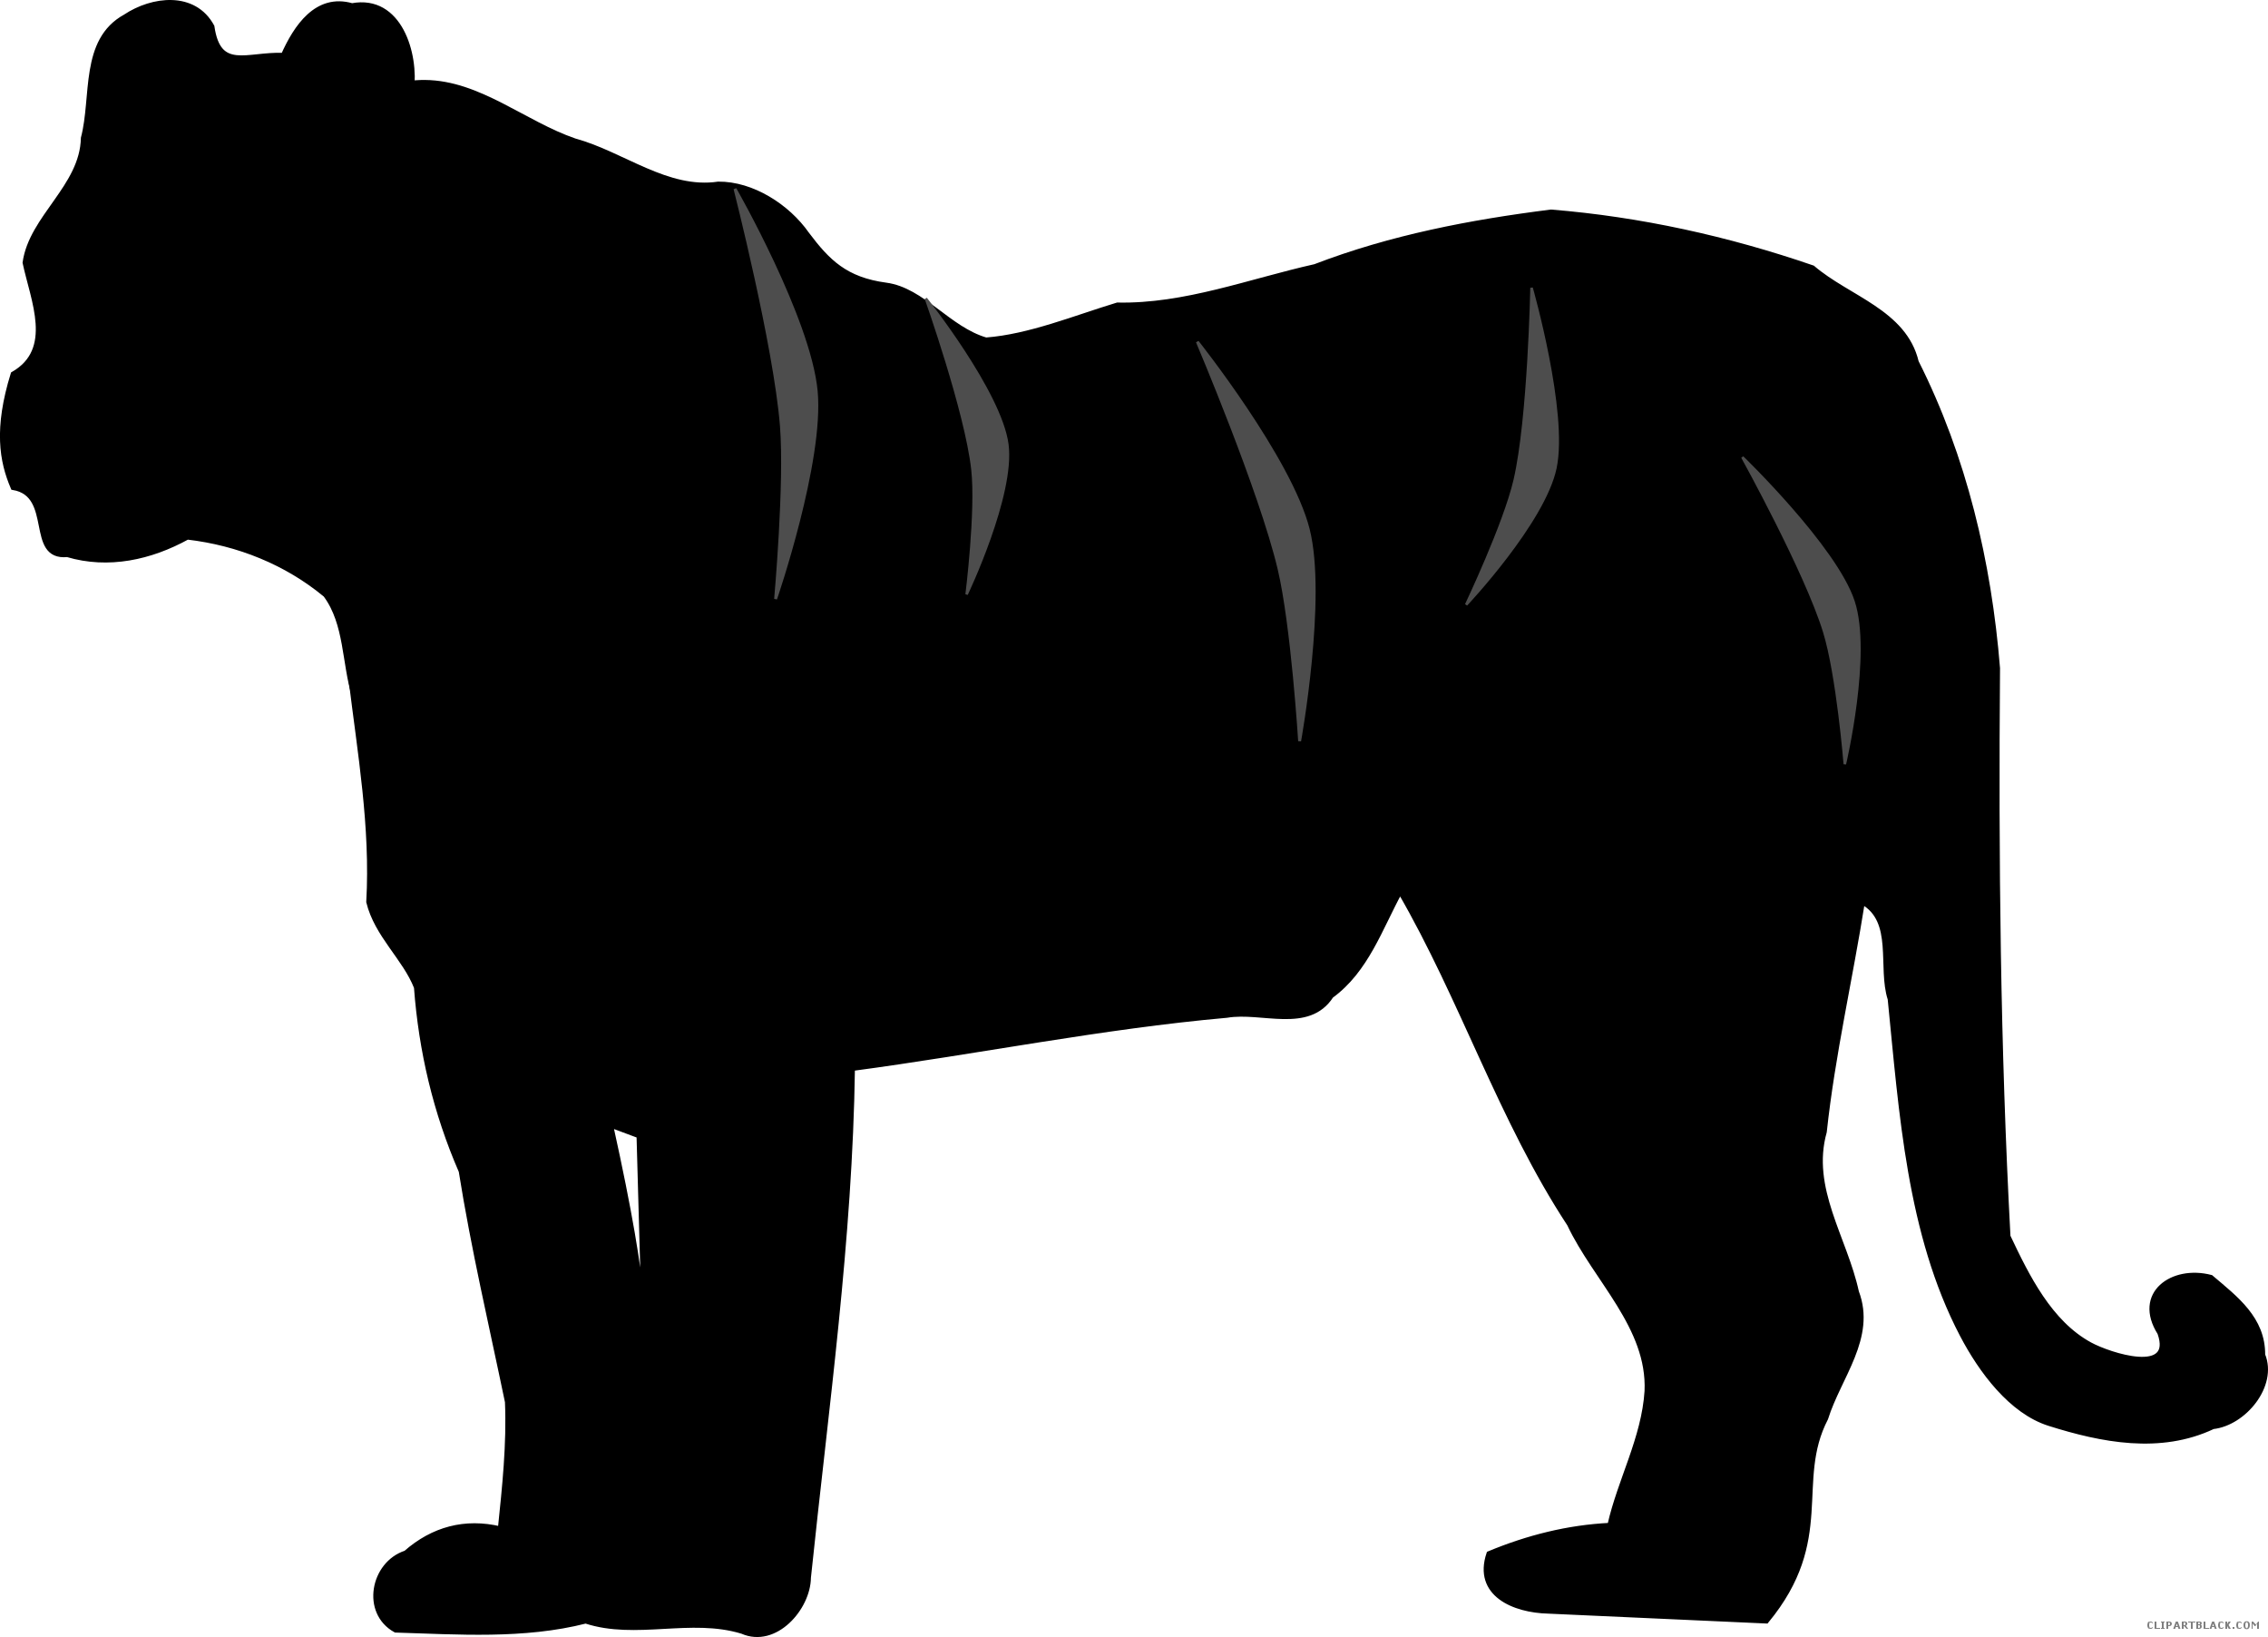 Silhouette free black white. Clipart tiger tiger animal